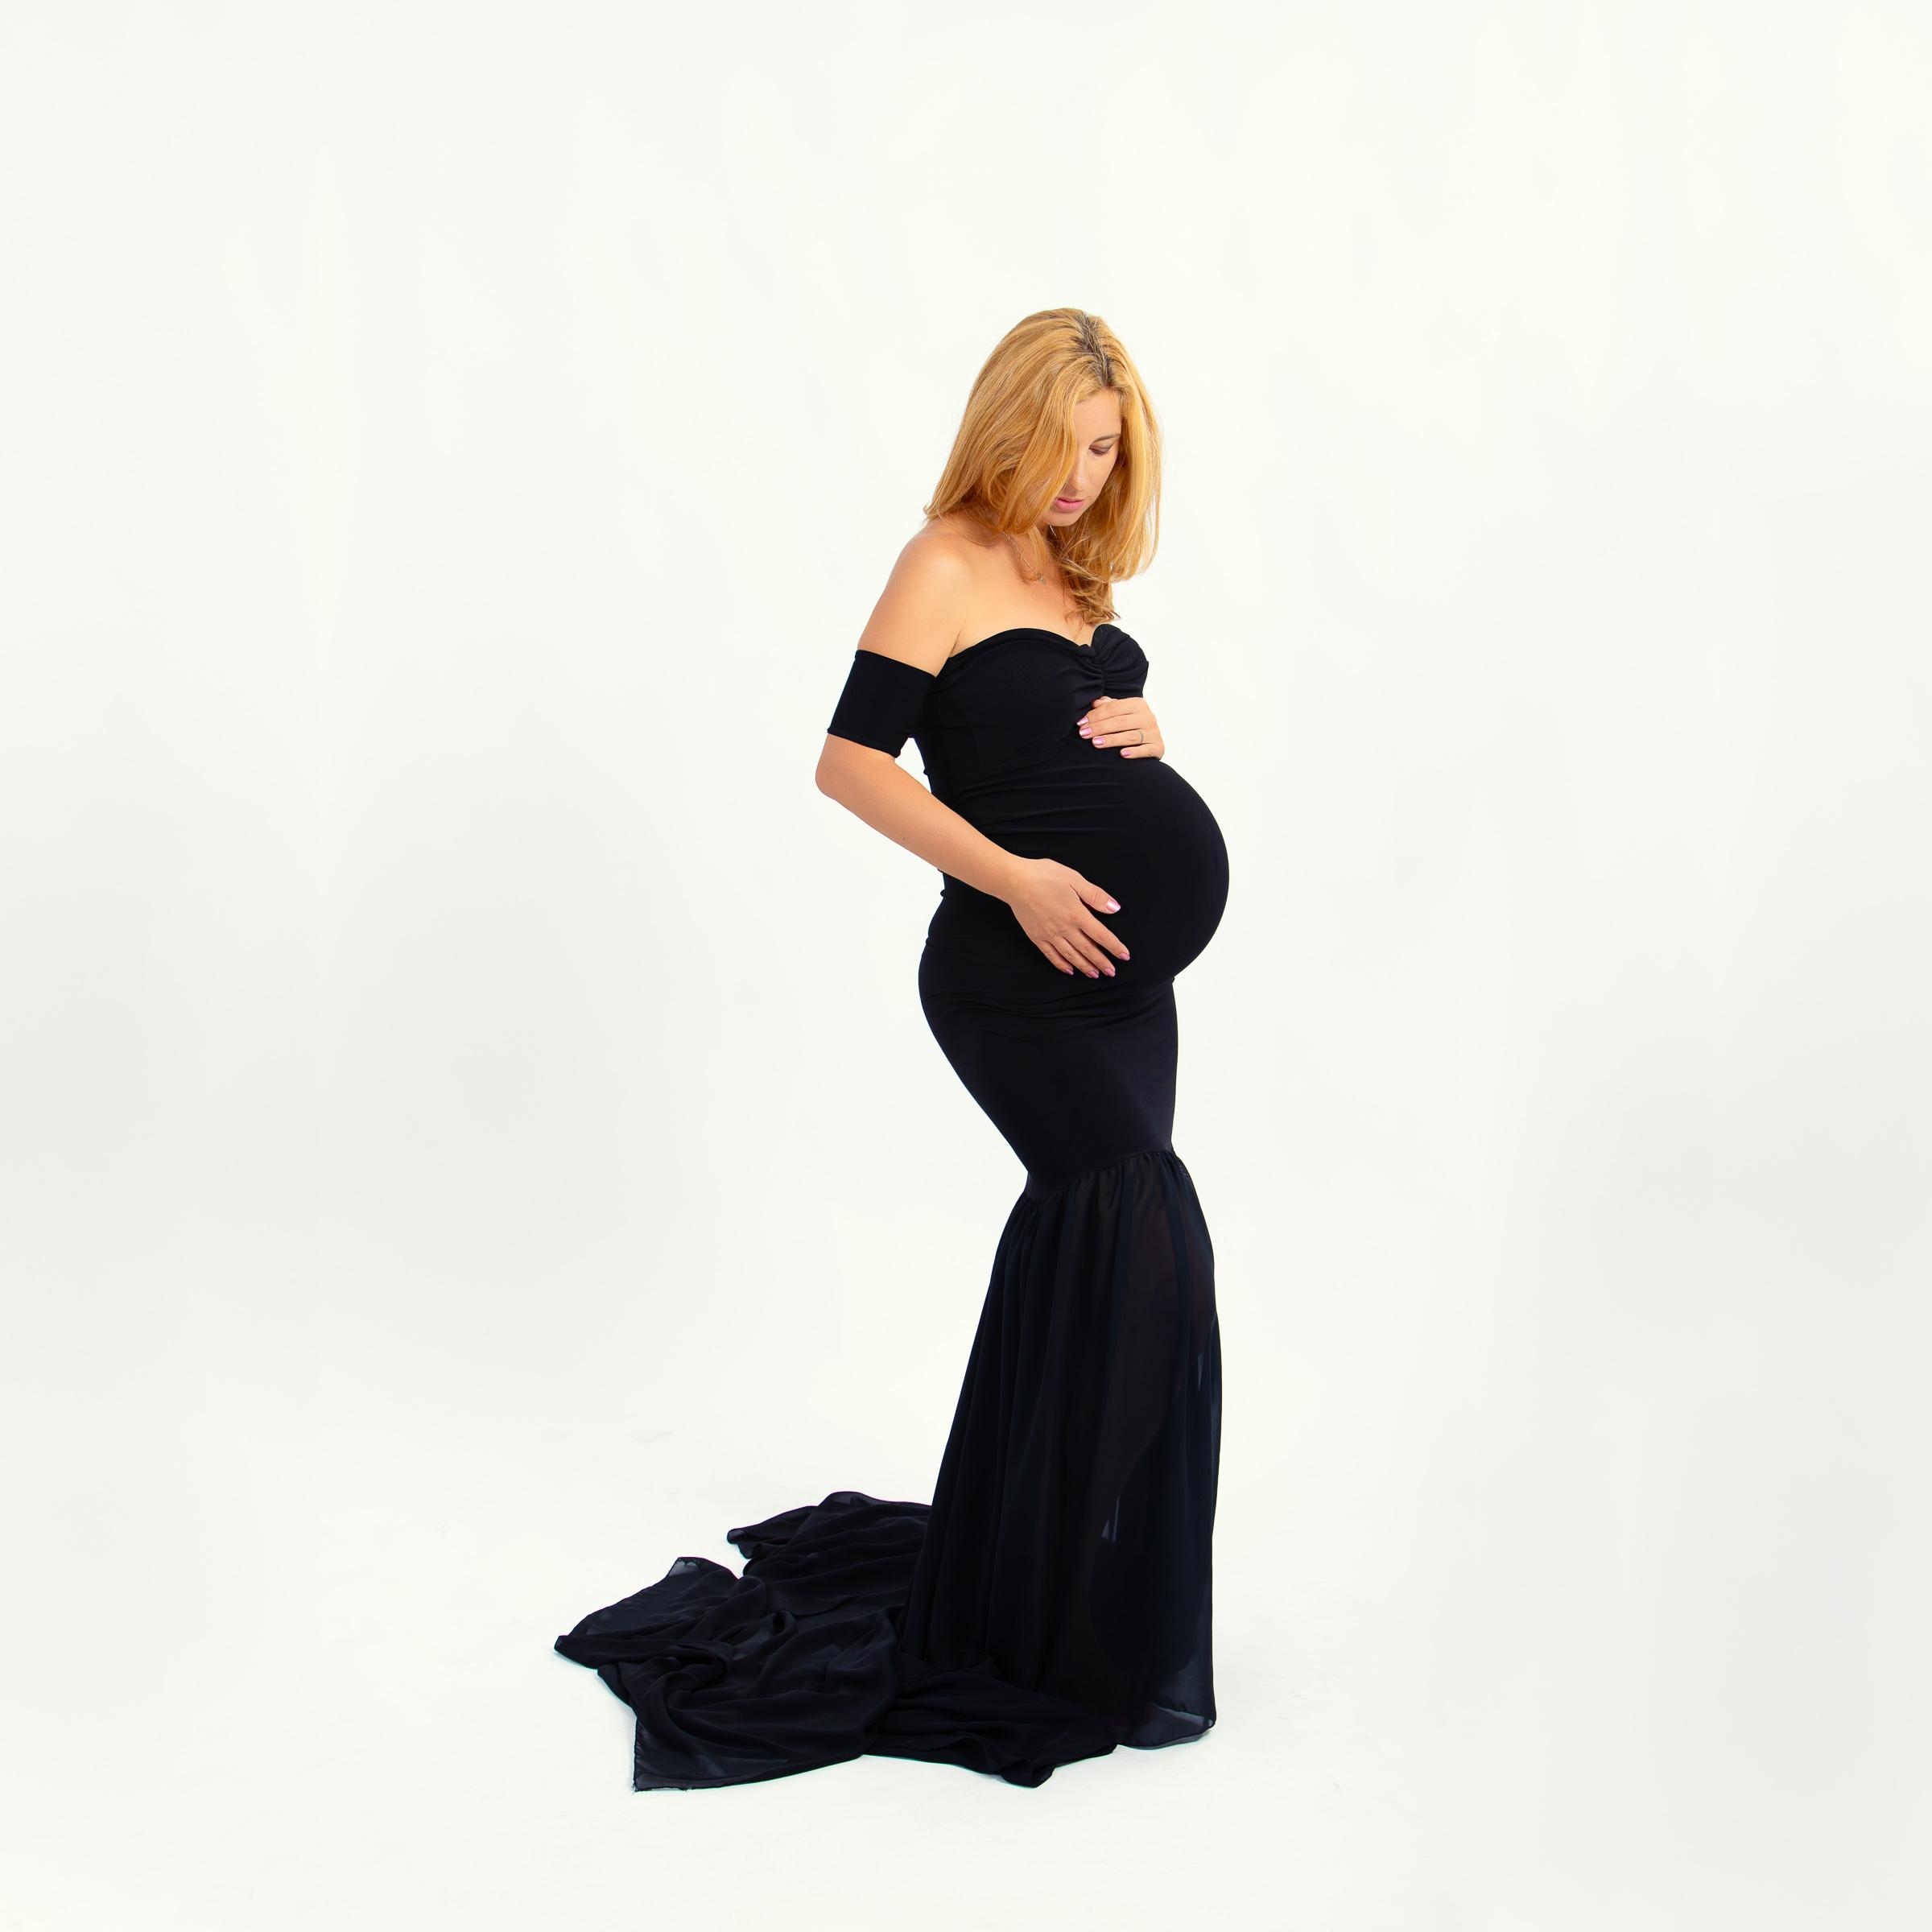 Poza maternitate studio Cluj